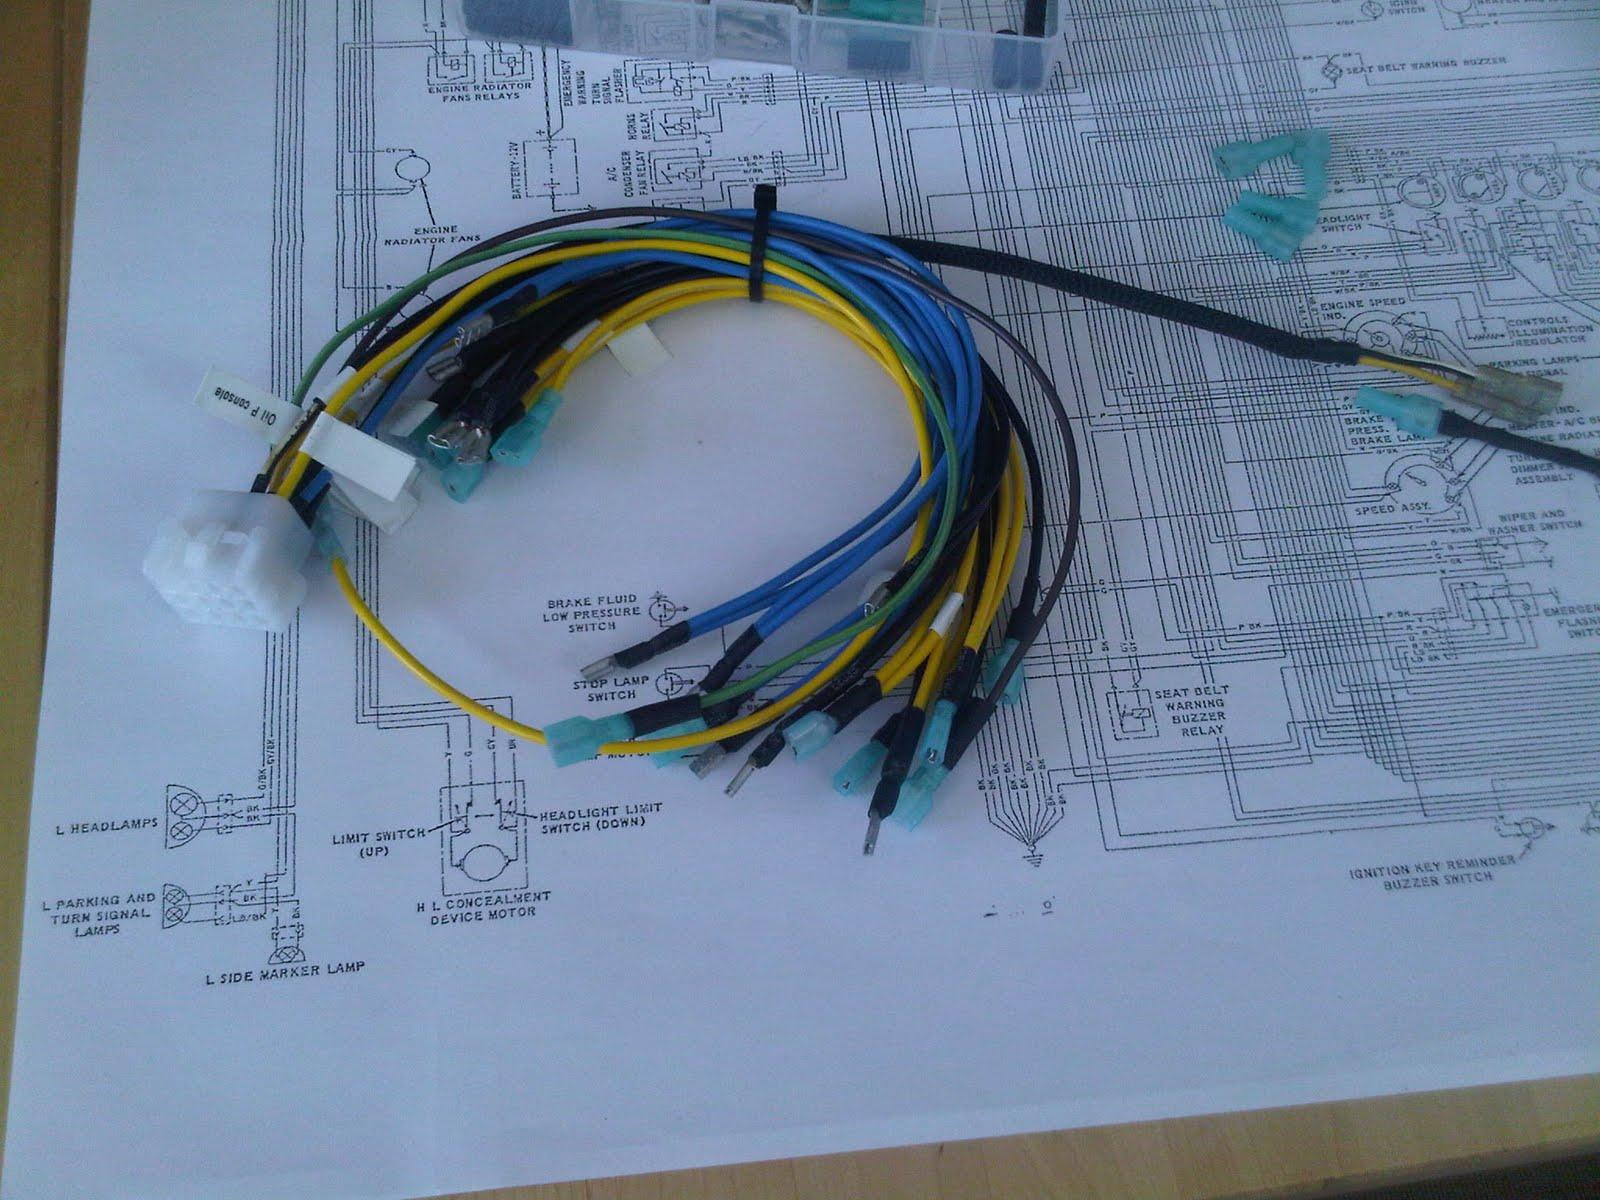 hight resolution of detomaso pantera wiring diagram wire data schema u2022 arctic cat snowmobile belt chart 1998 550